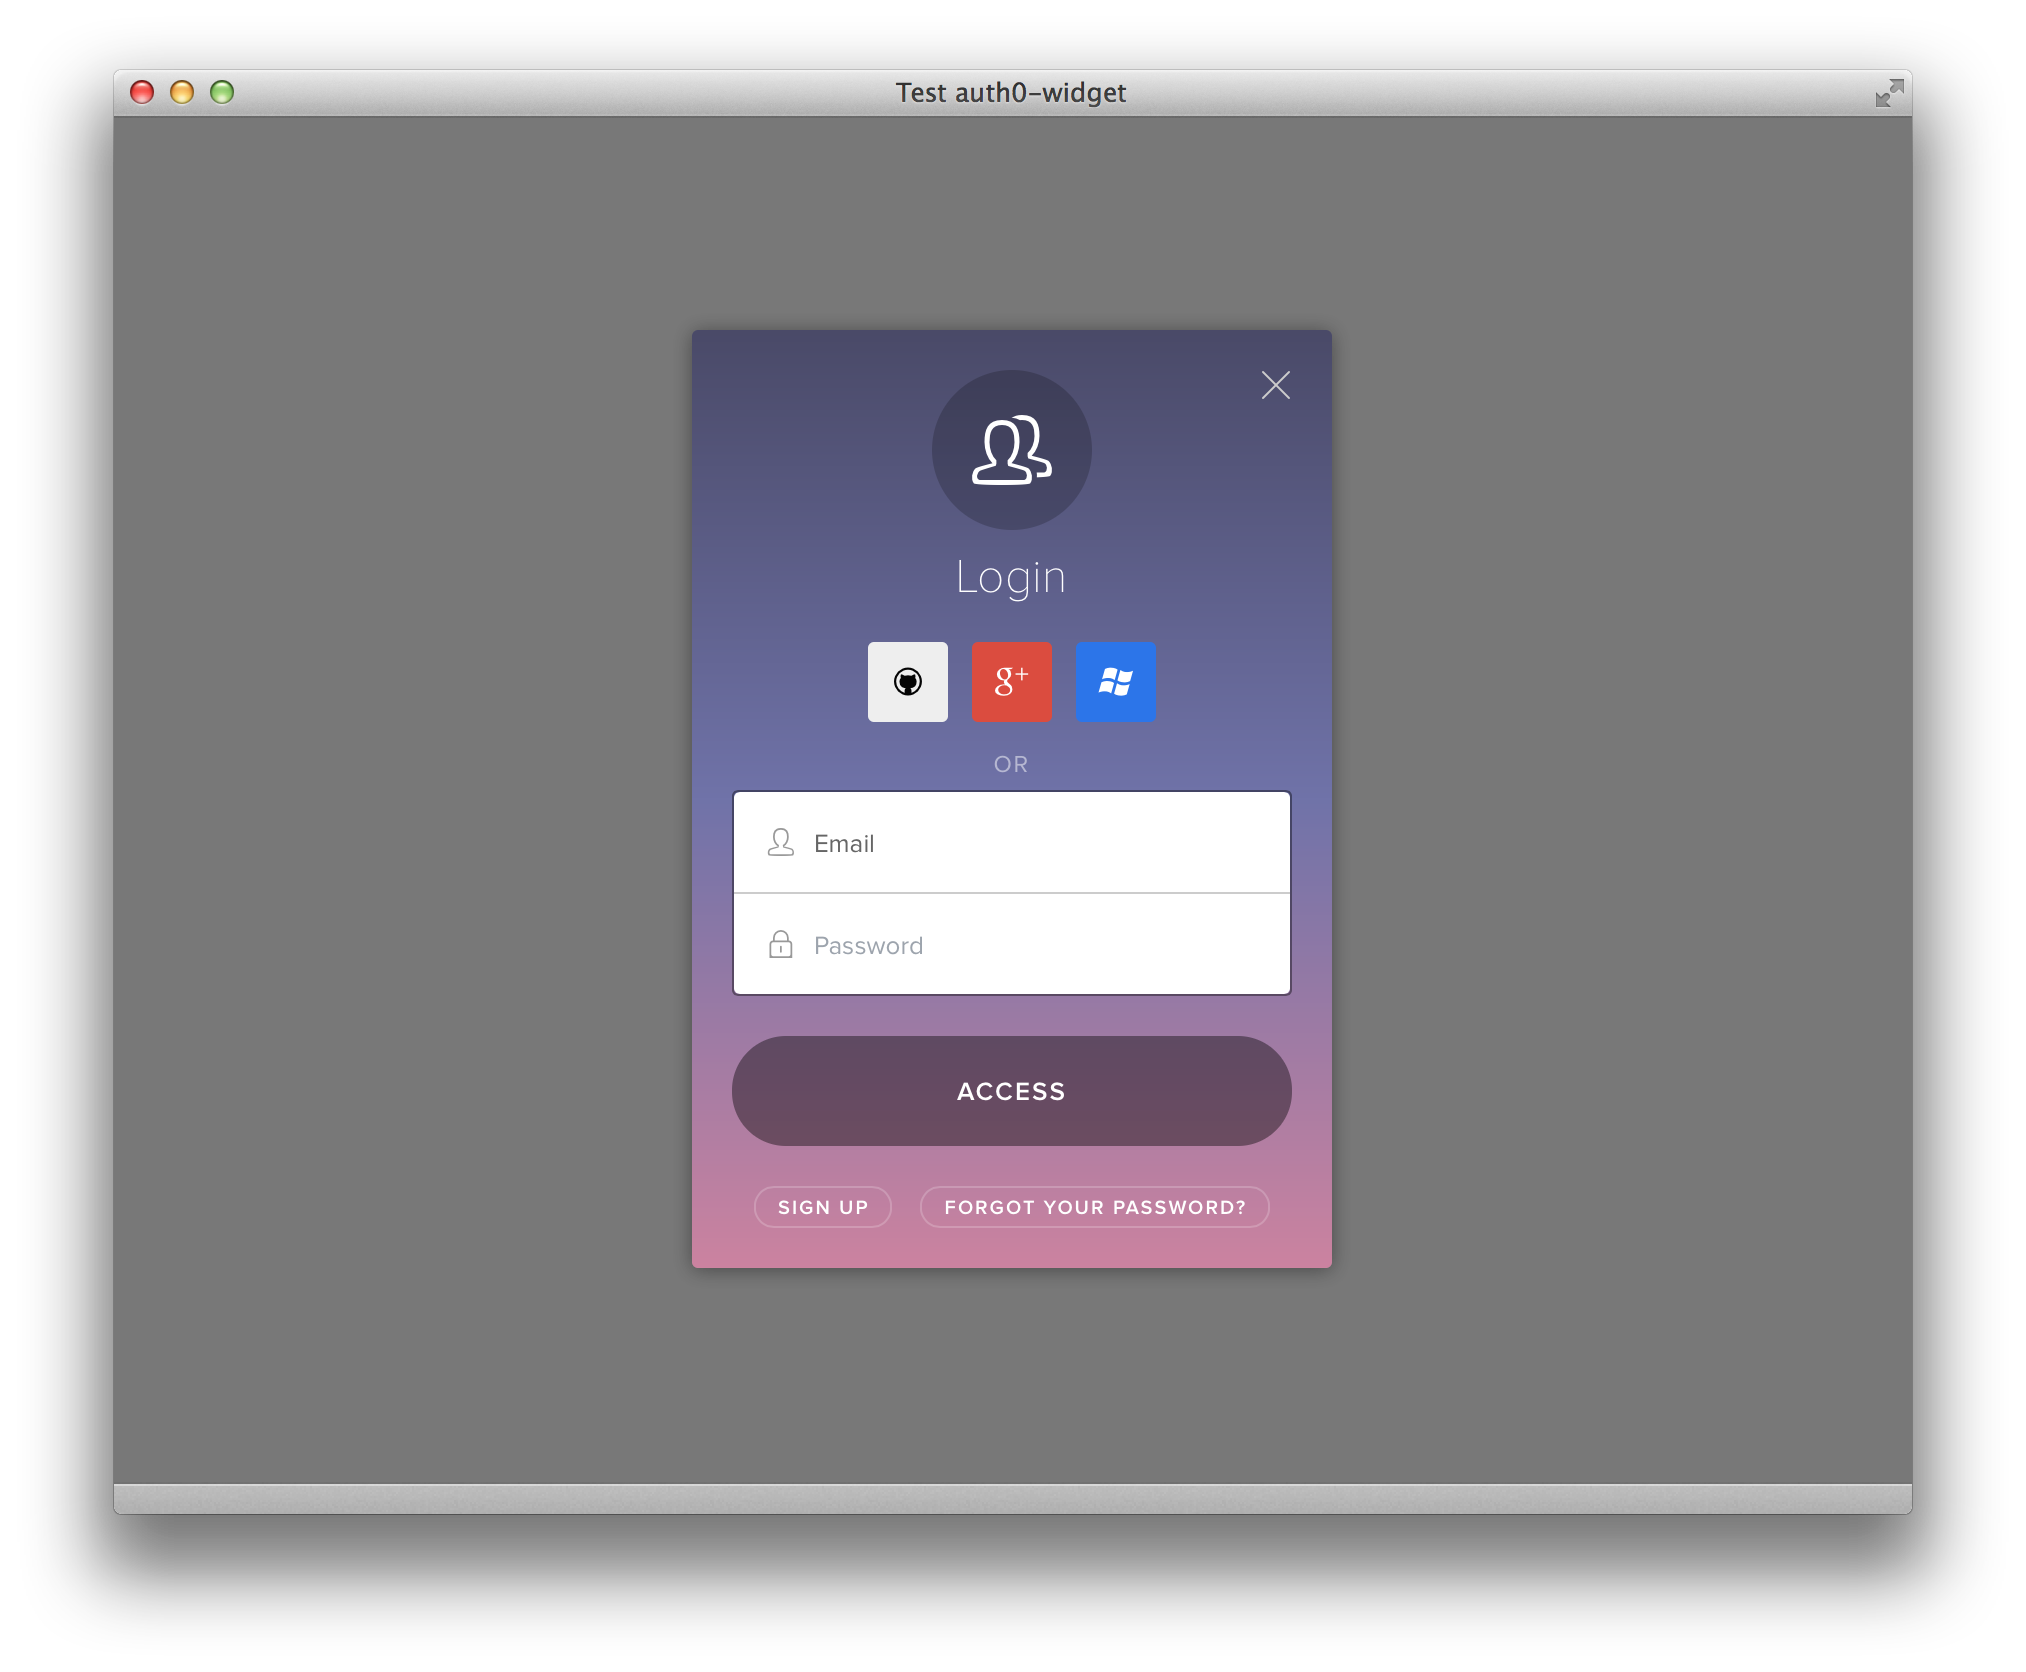 GitHub - auth0/lock-theme-gradient: [DEPRECATED] Gradient